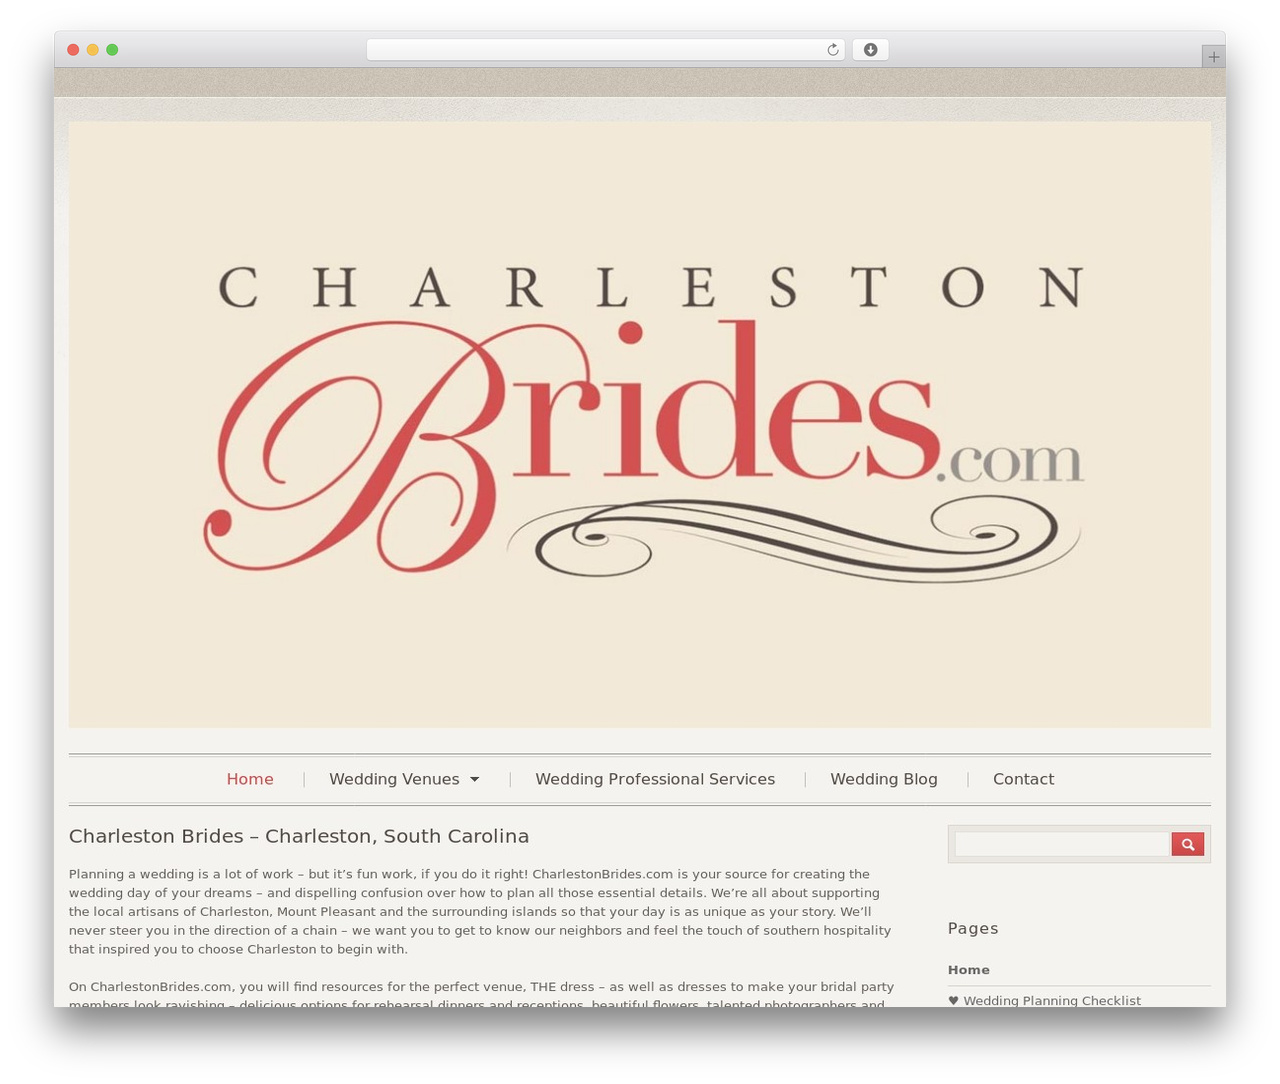 Klasik WordPress template - charlestonbrides.com